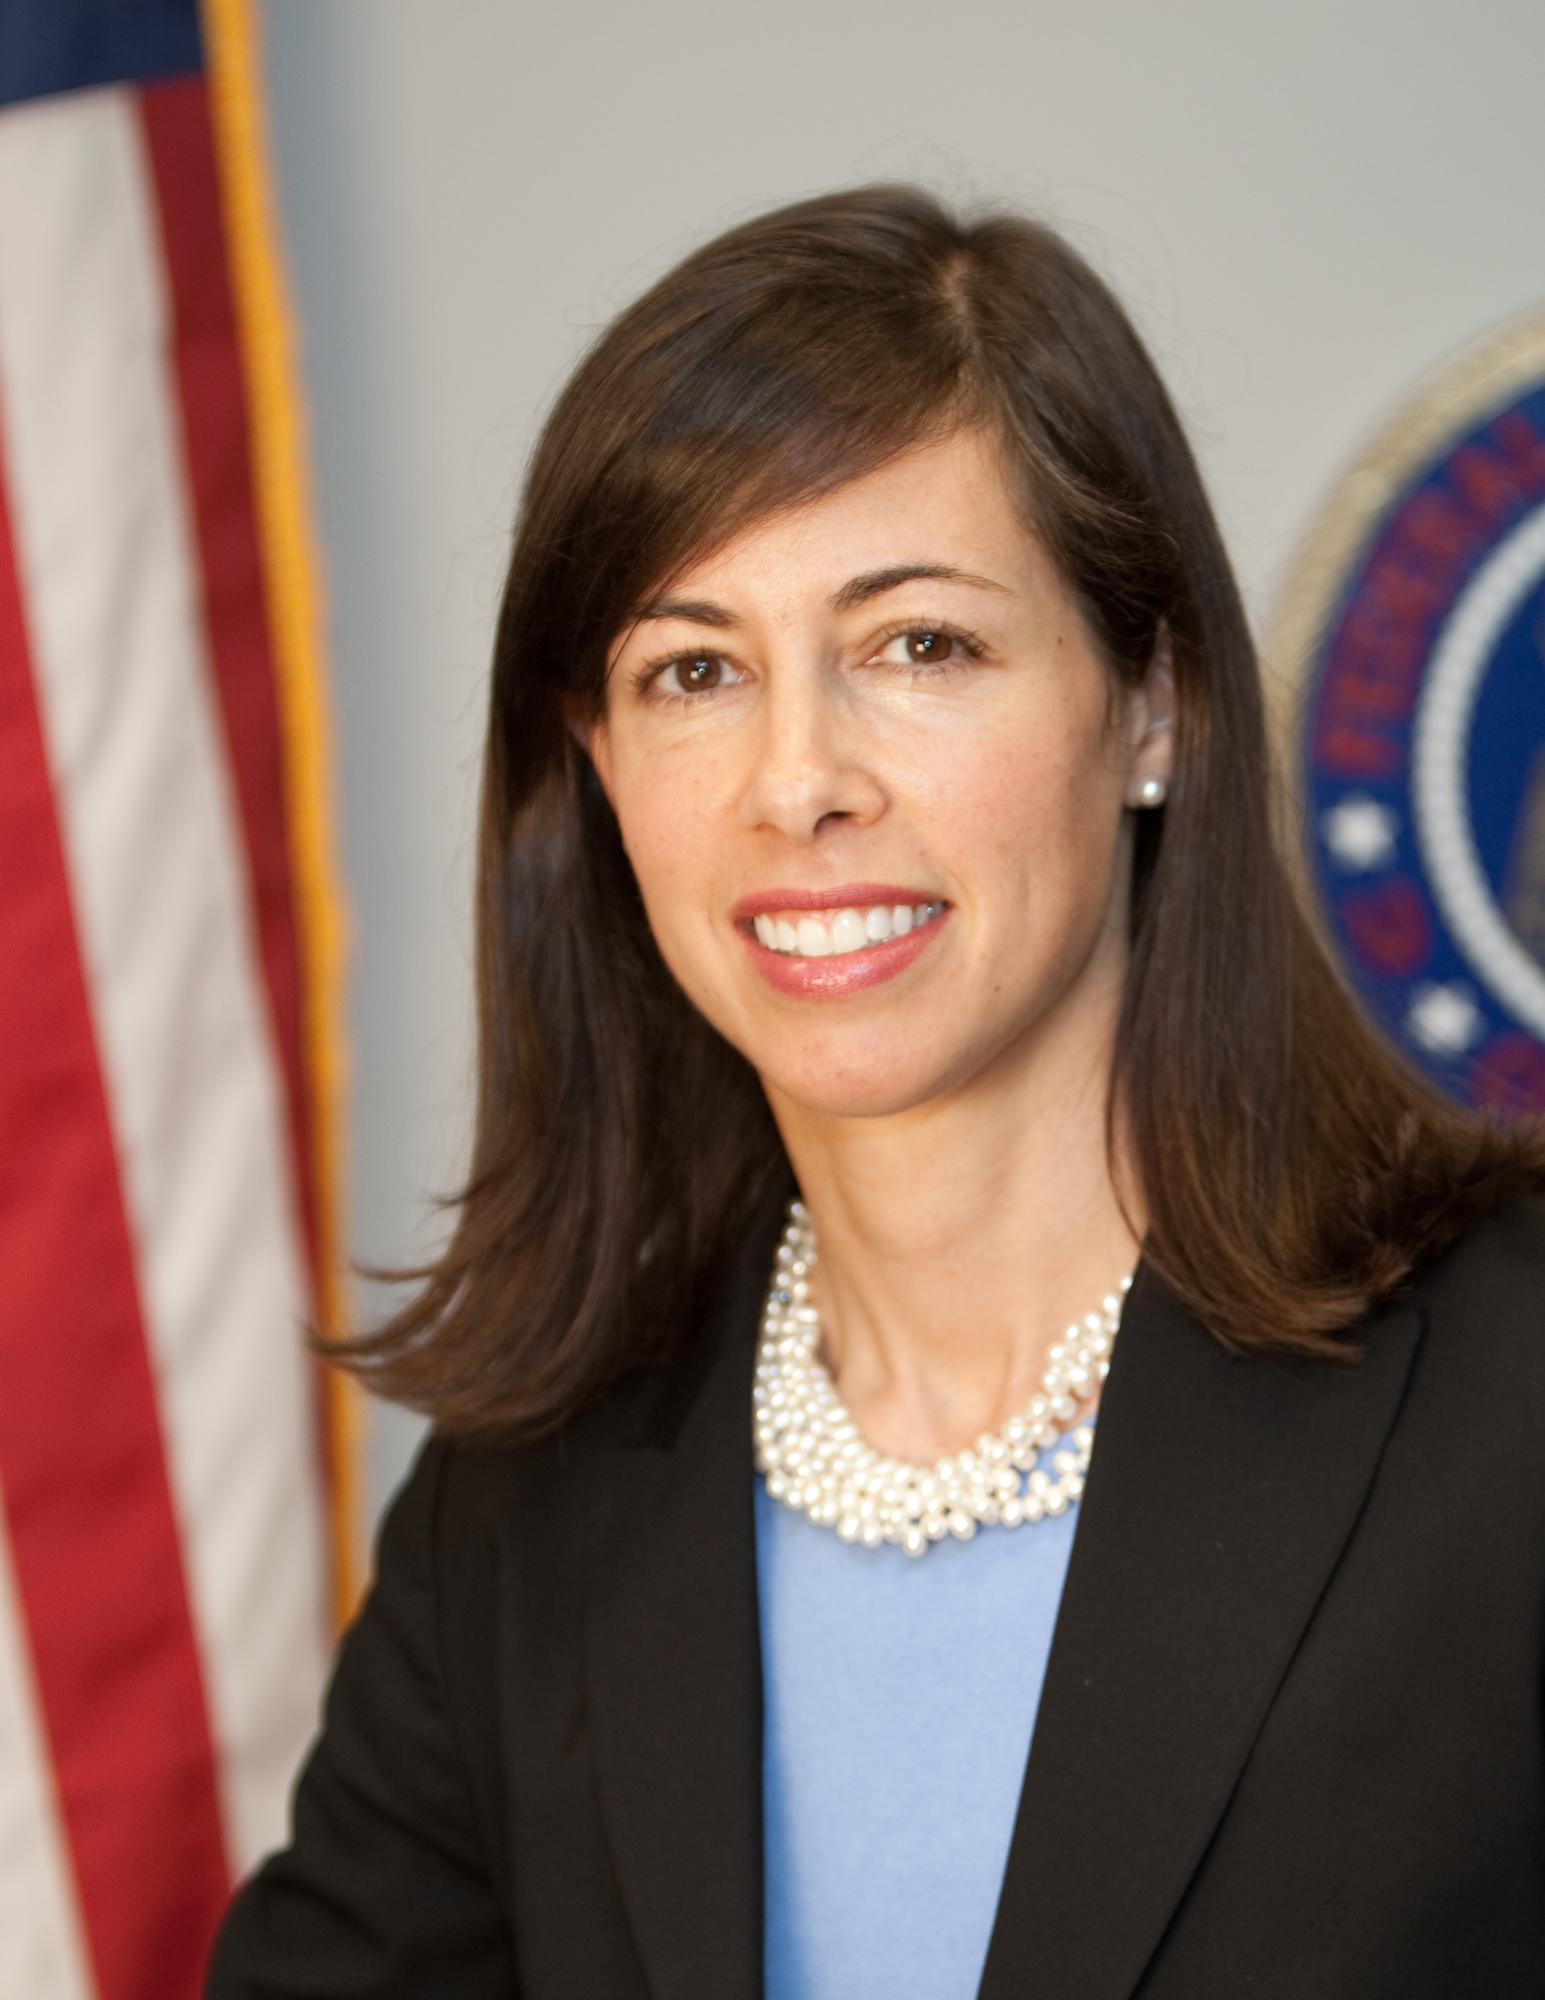 Jessica Rosenworcel